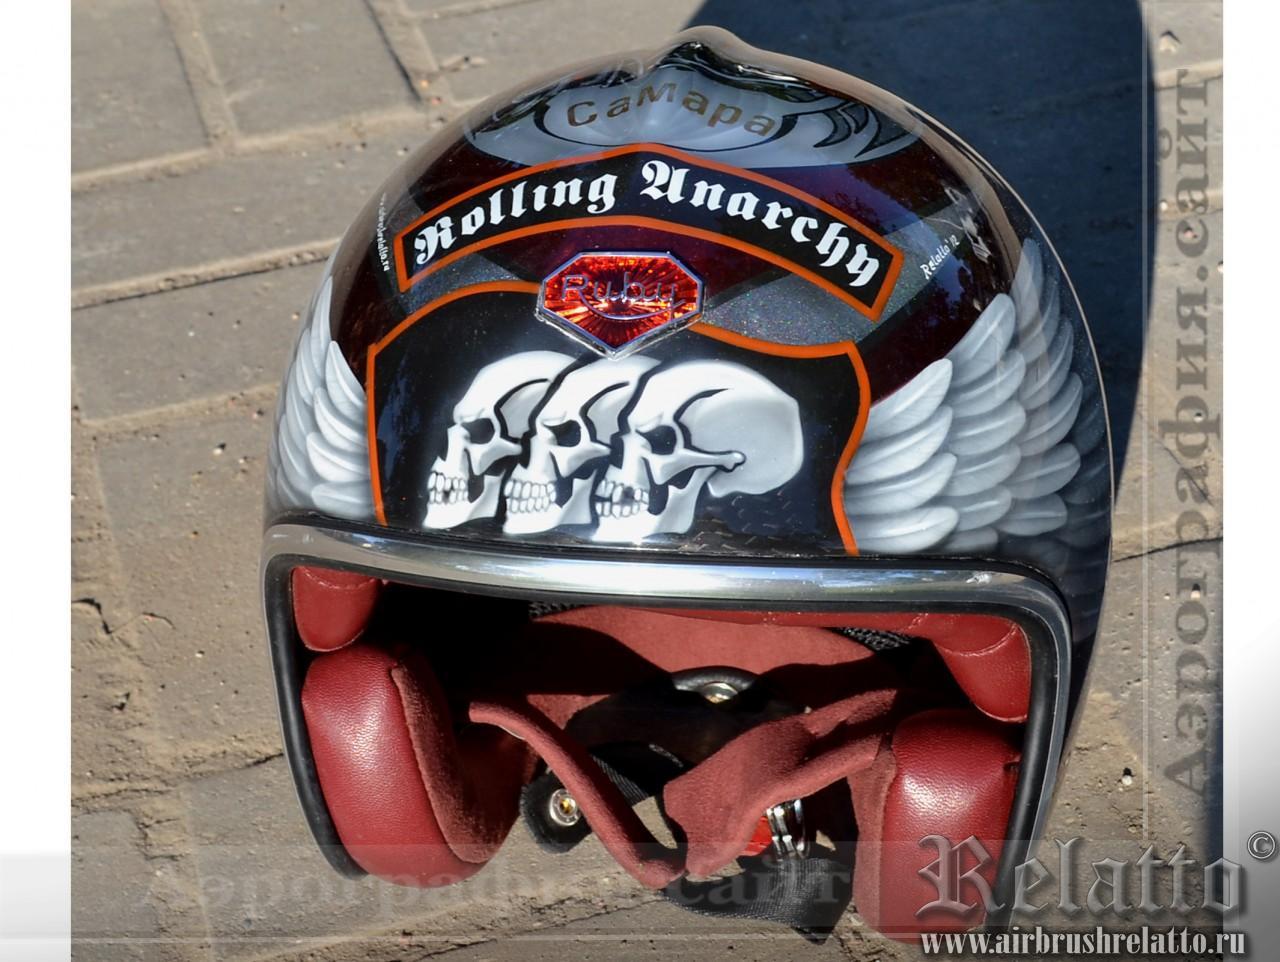 Шлем с аэрографией Роллинг Анархии Самара